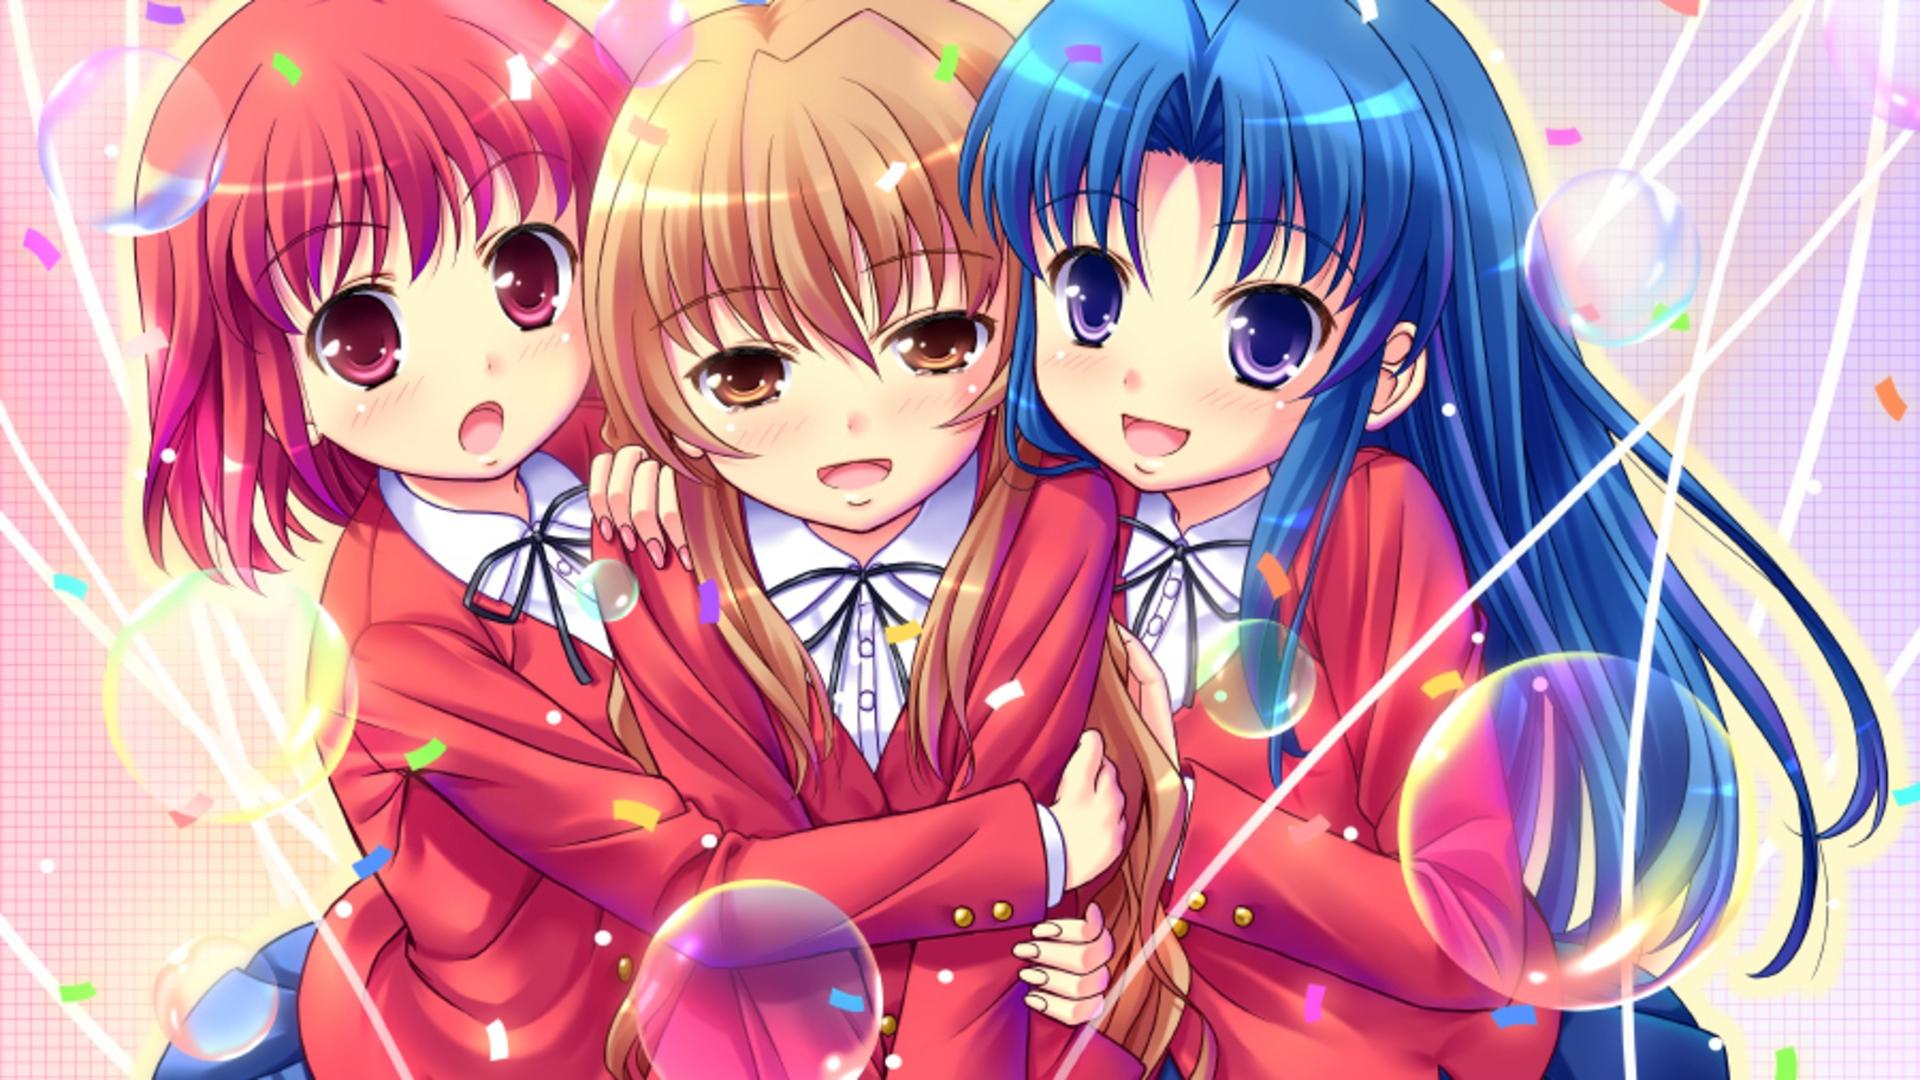 Download Wallpaper 1920x1080 anime girls cute smile hug Full HD 1920x1080